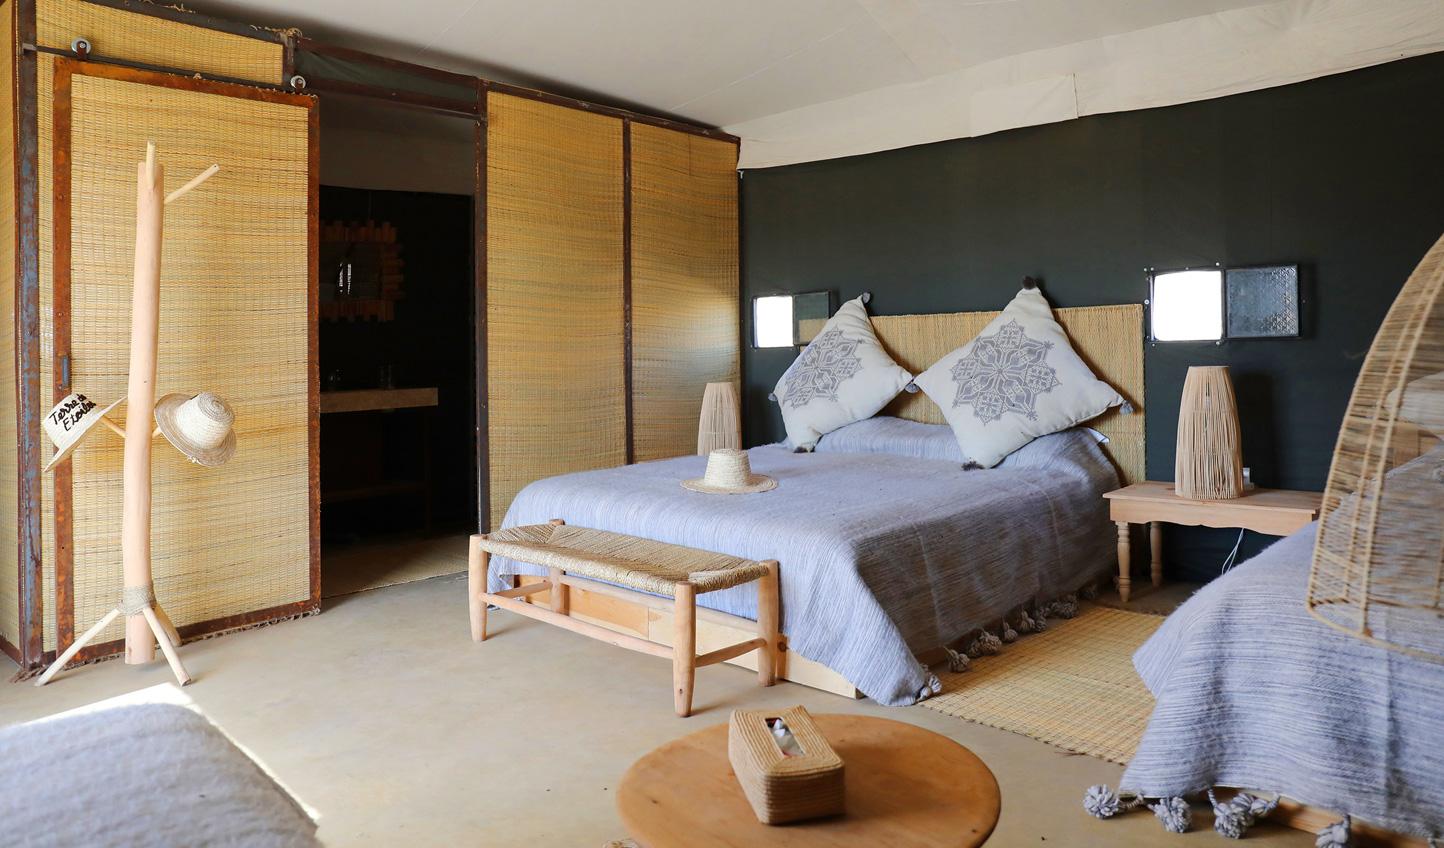 Luxurious furnishings make the desert nights experience one of unsurpassed comfort